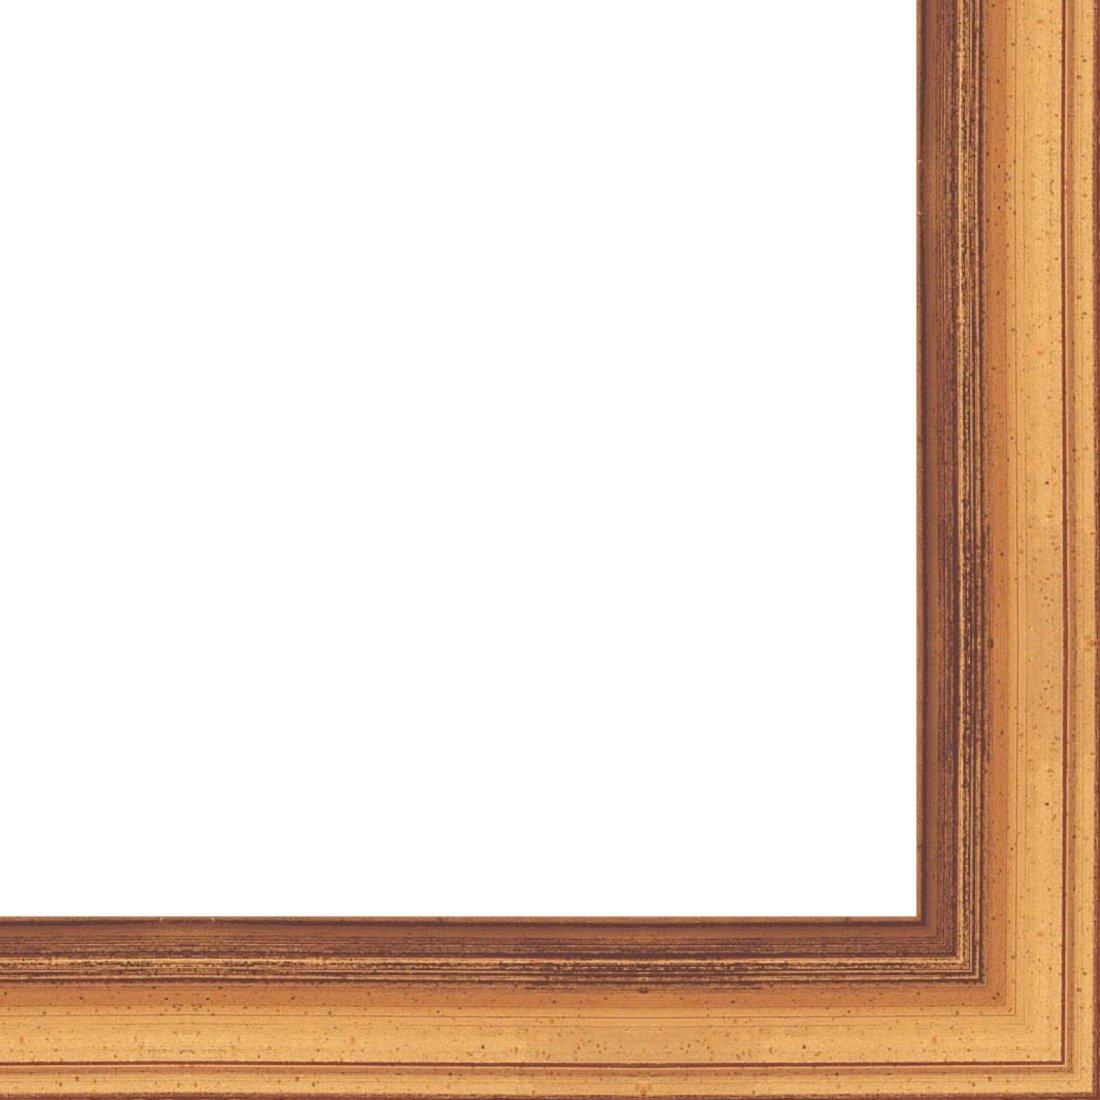 Picture Frame Moulding (Wood) 18ft bundle - Traditional Antique Gold Finish - 1'' width - 7/16'' rabbet depth